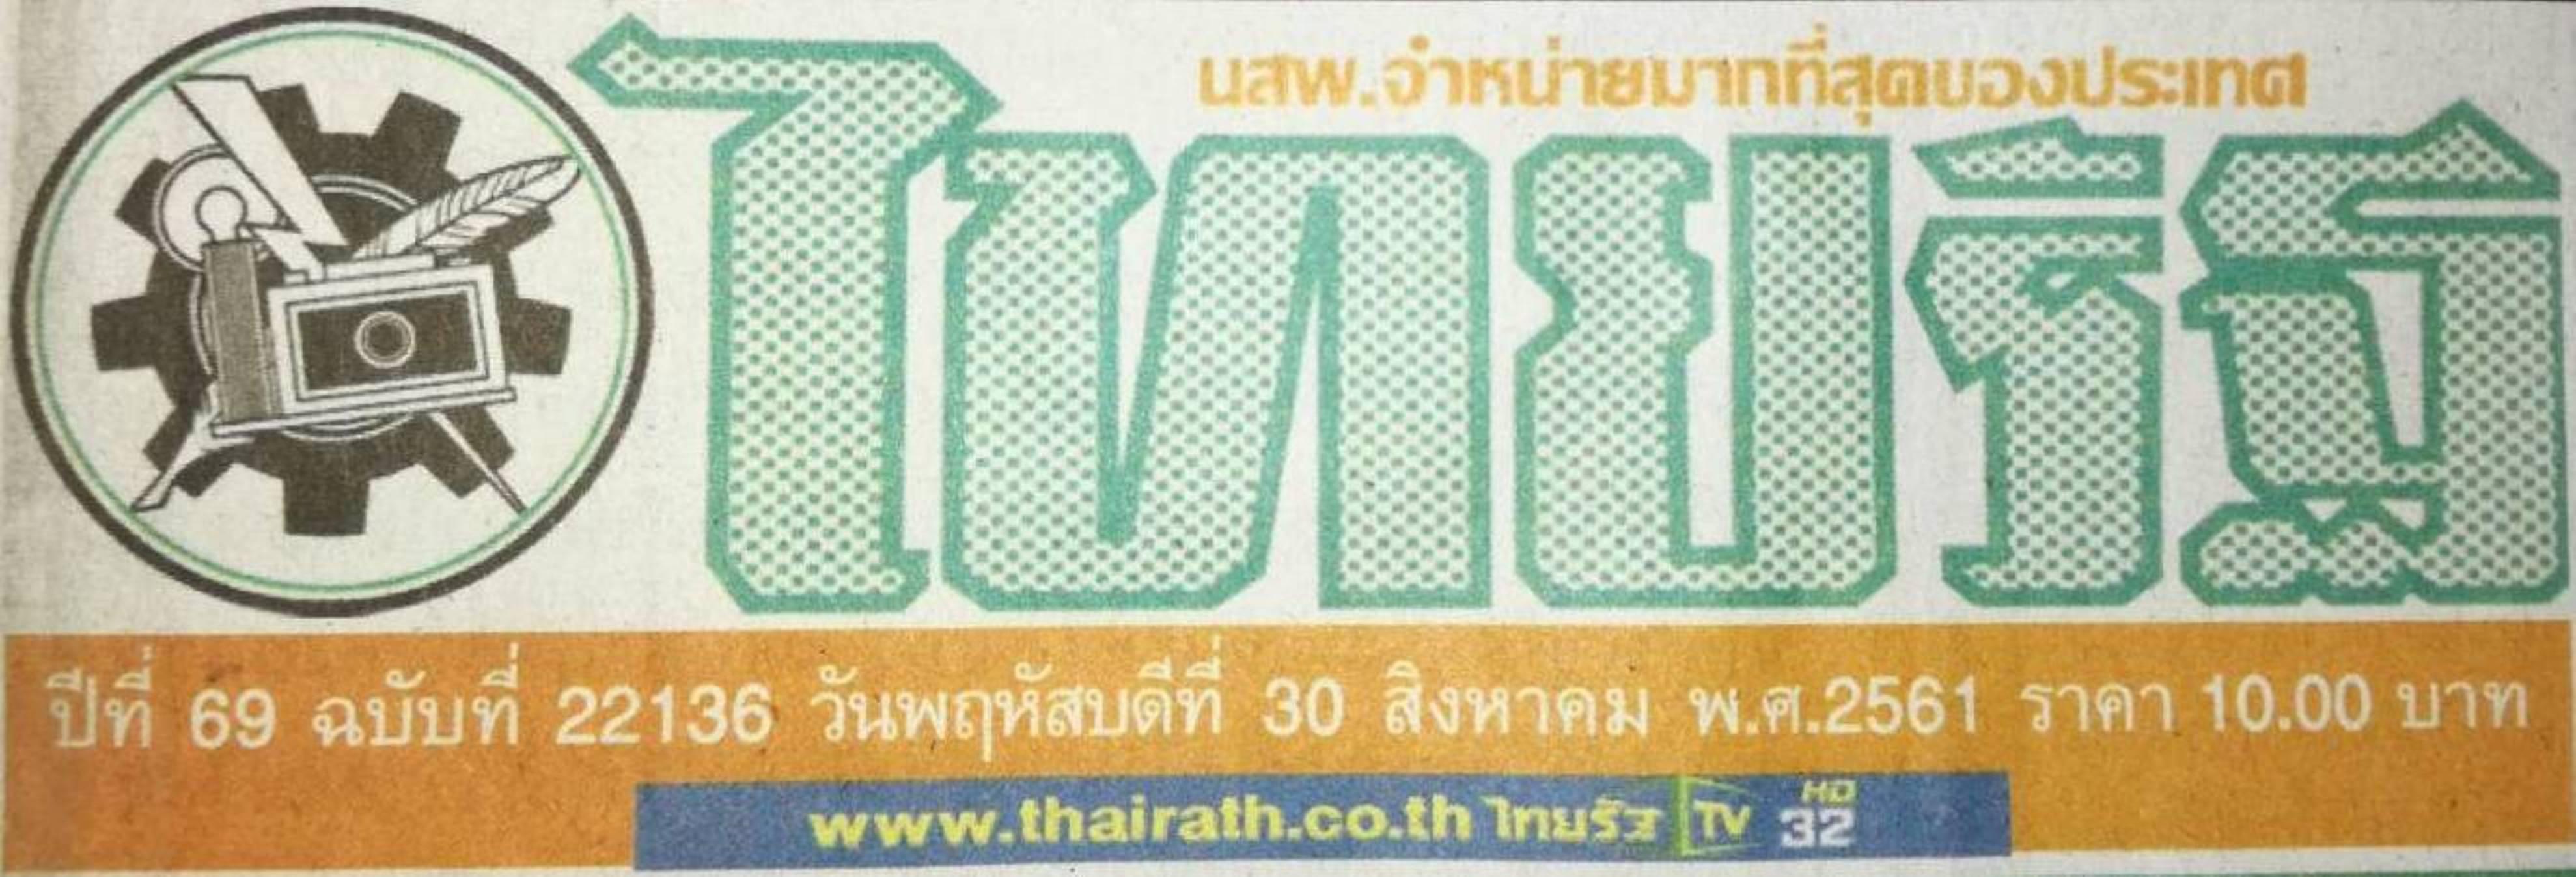 t 1 300861